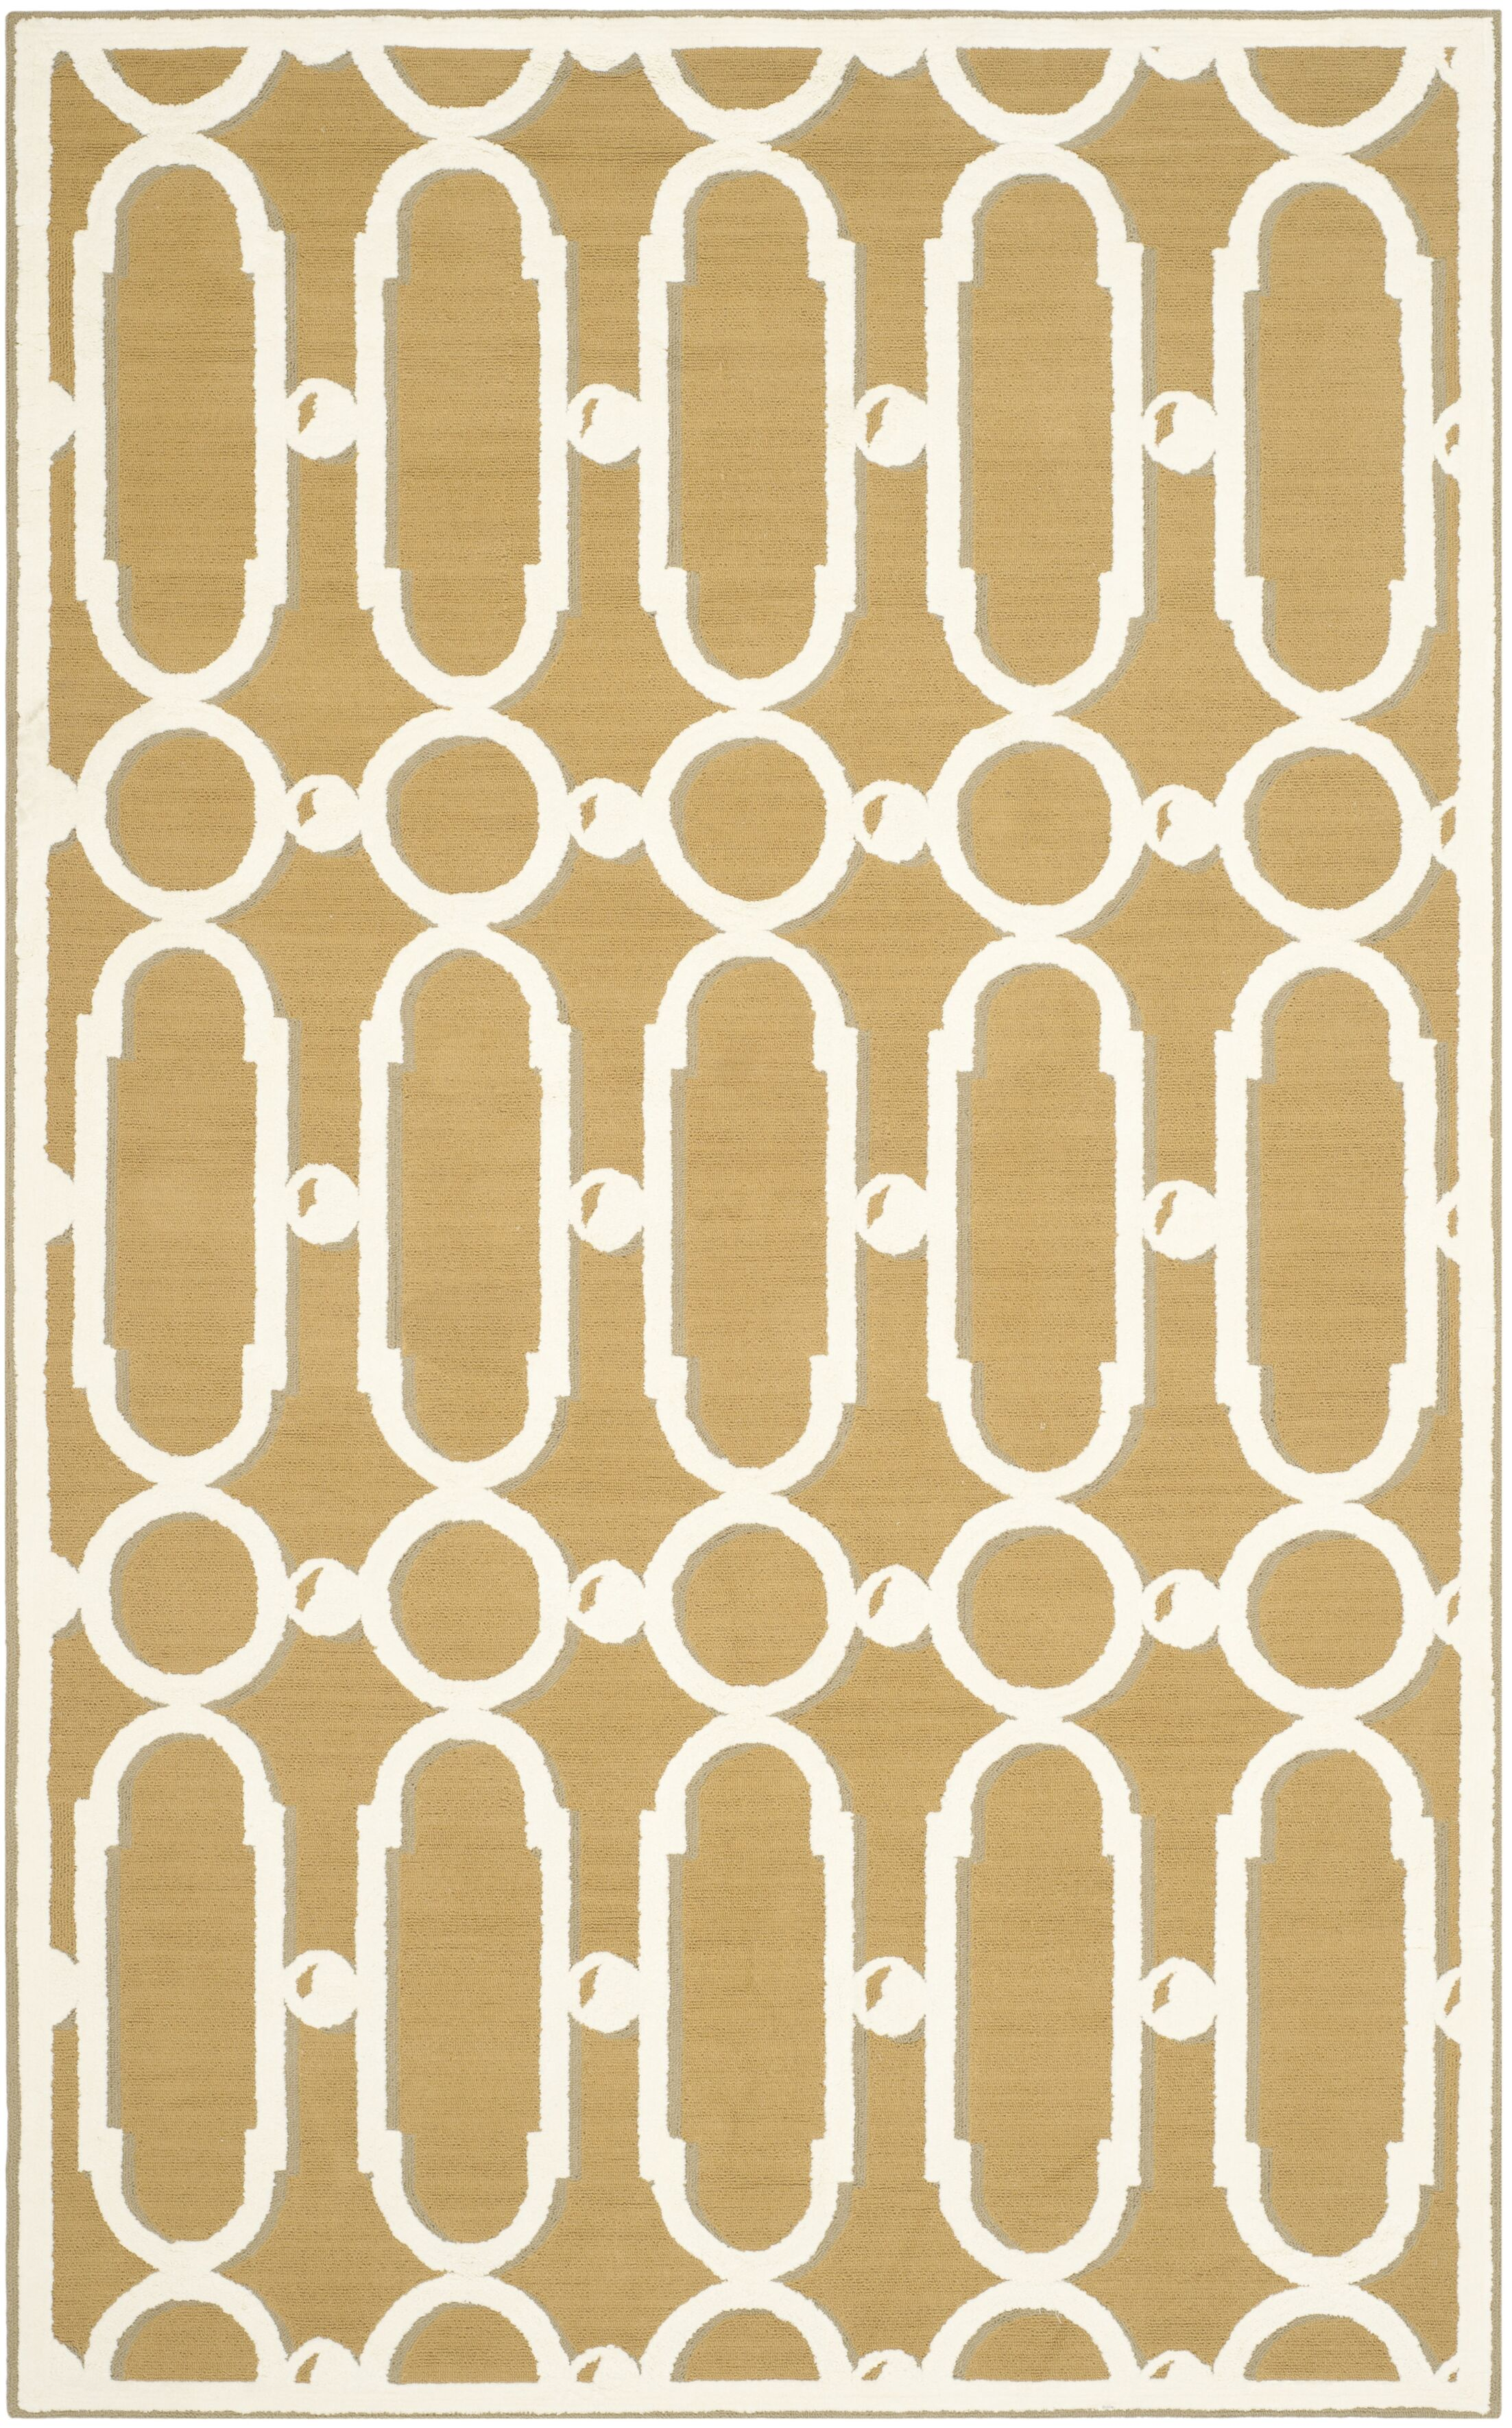 Sheeran Olive/White Geometric Area Rug Rug Size: Rectangle 5'6